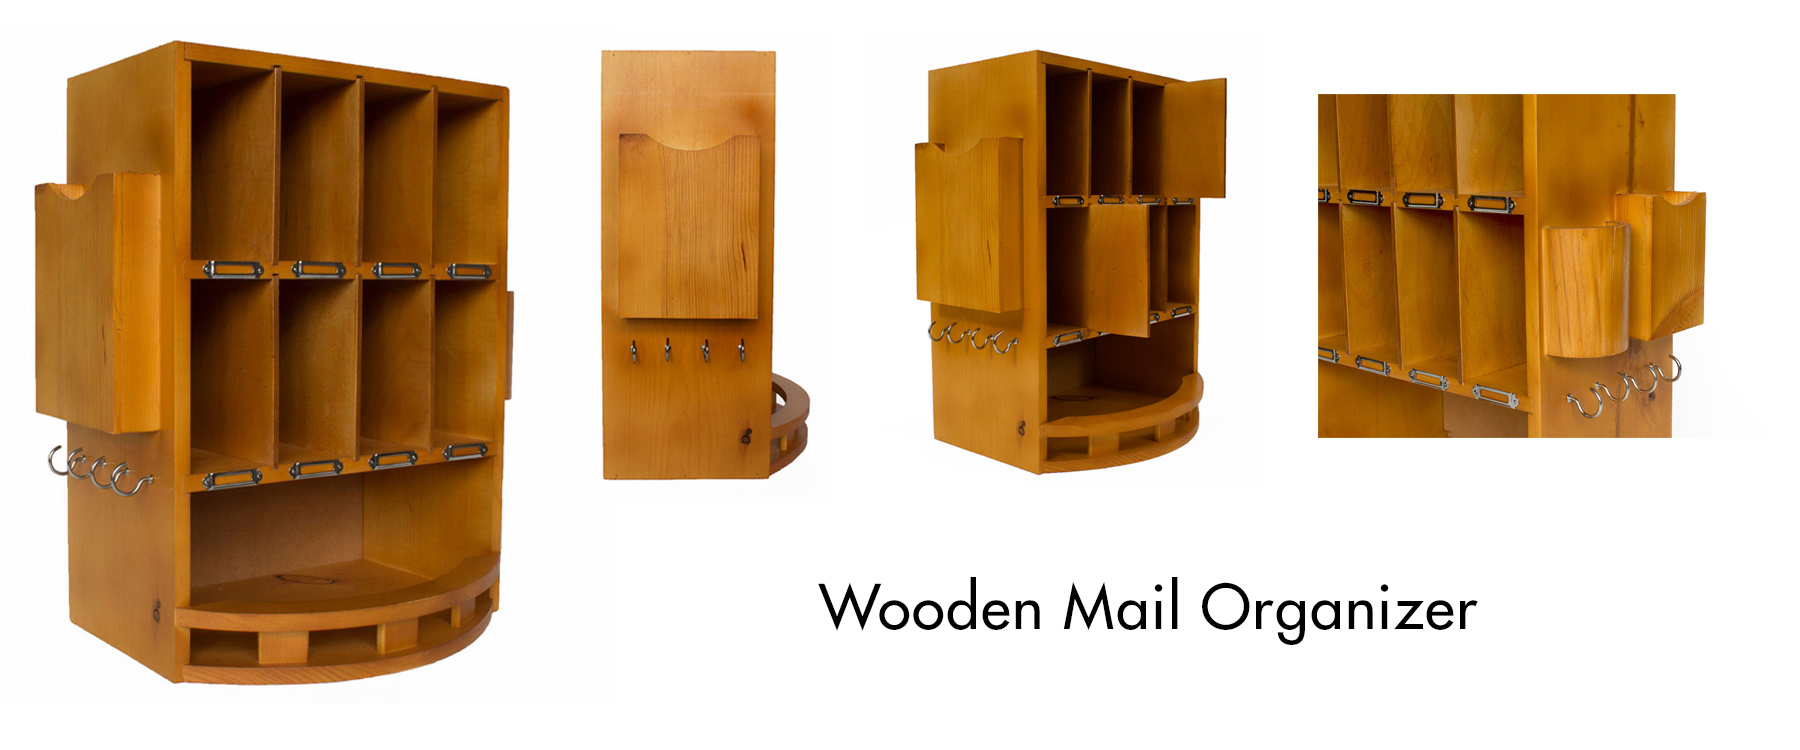 wooden-mail-organzier-slide.jpg